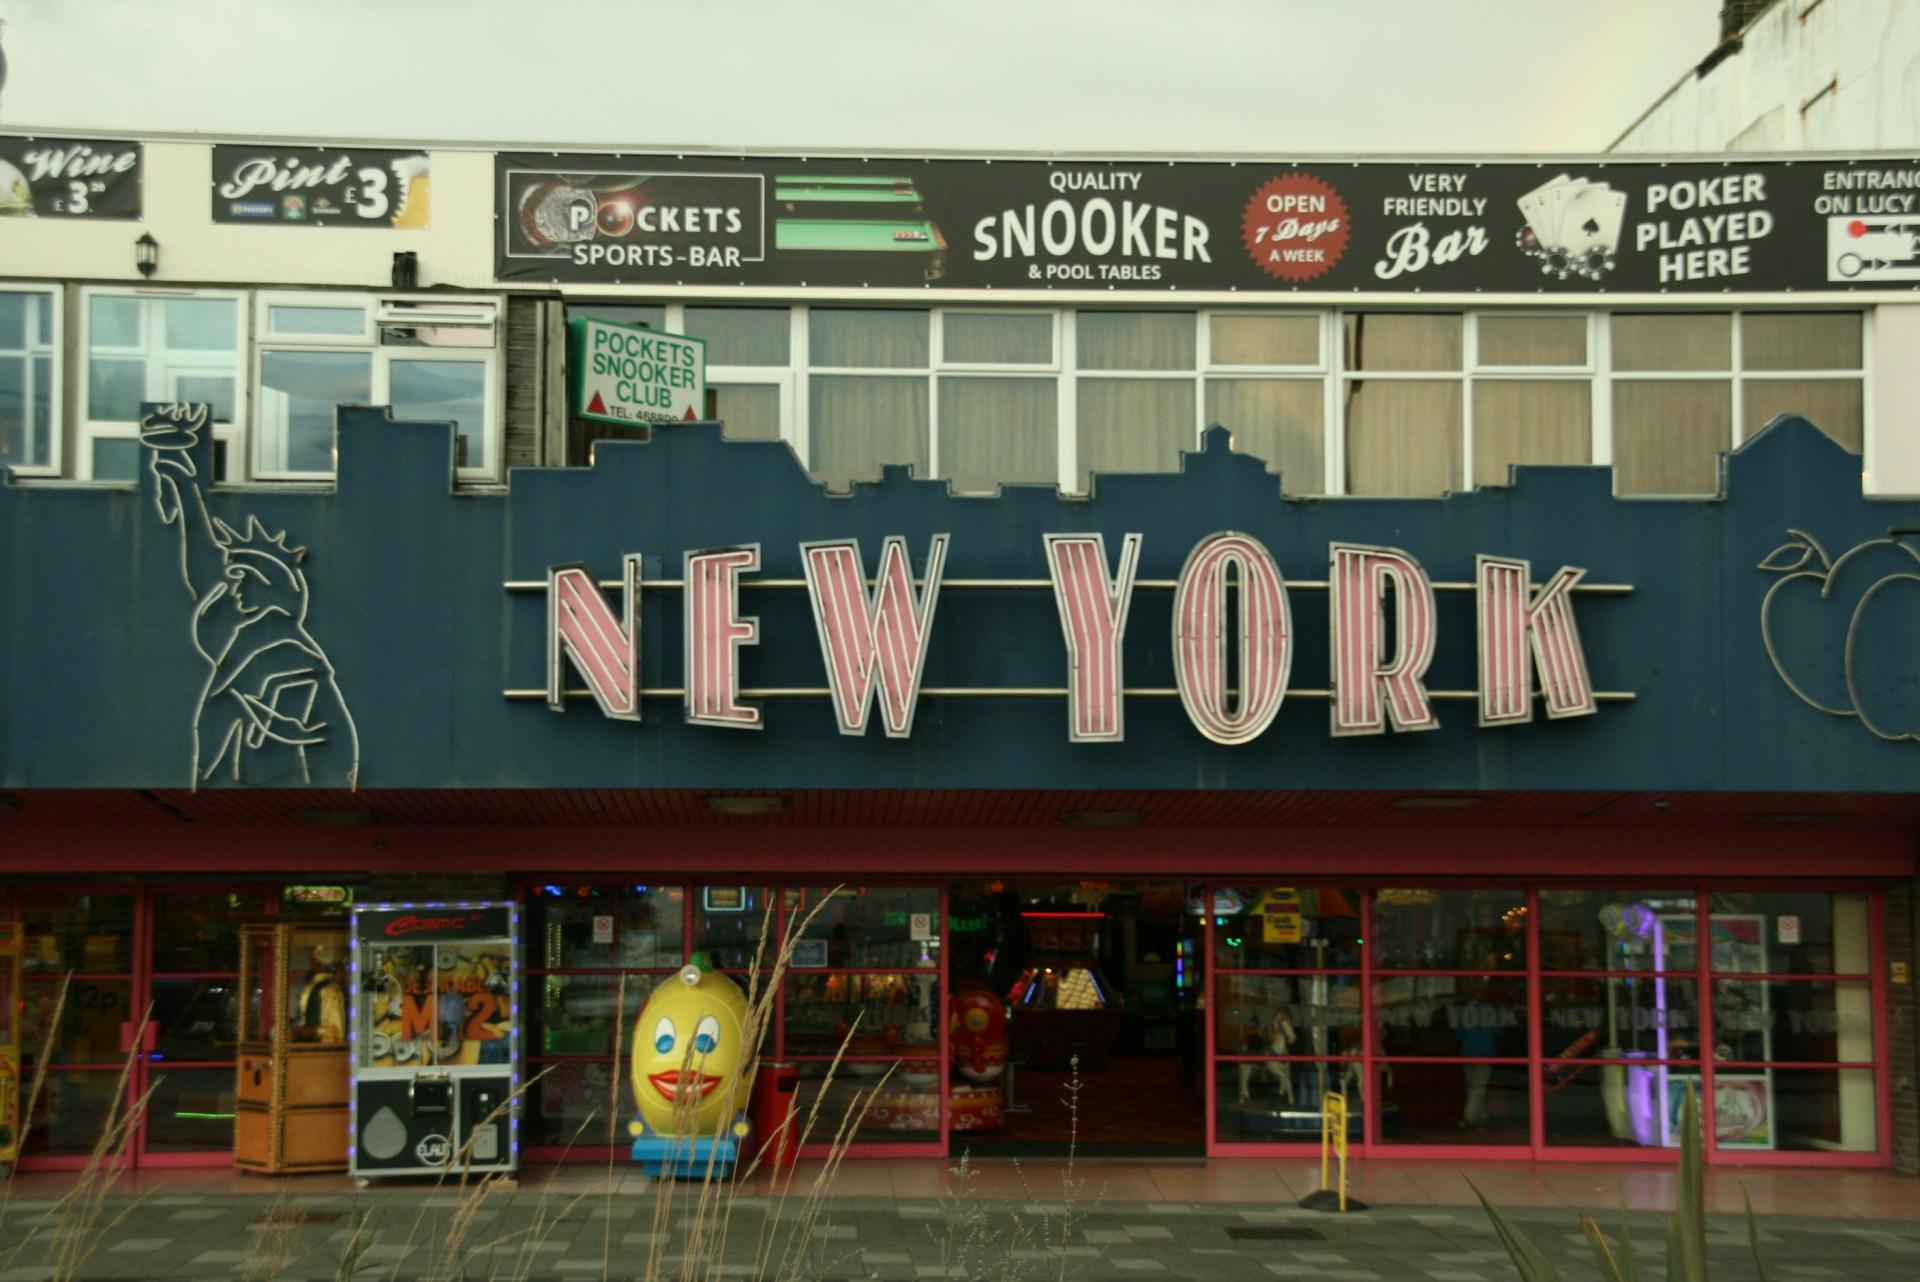 Amusement arcade in Southend